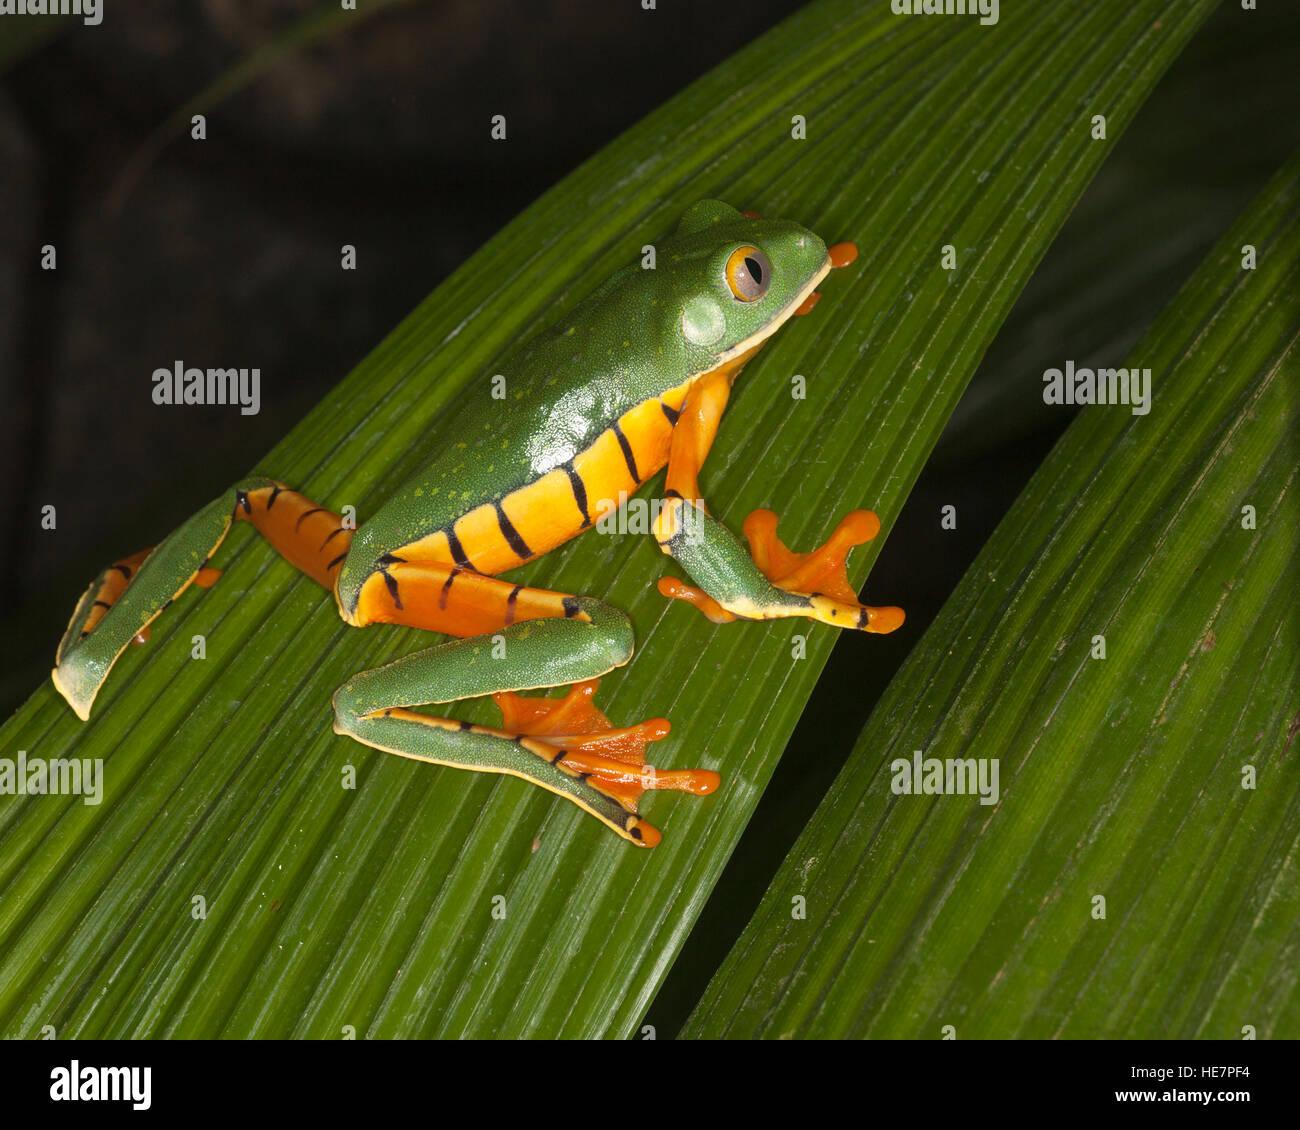 Golden-eyed Leaf Frog (Cruziohyla calcarifer) on a leaf in a tropical garden Stock Photo